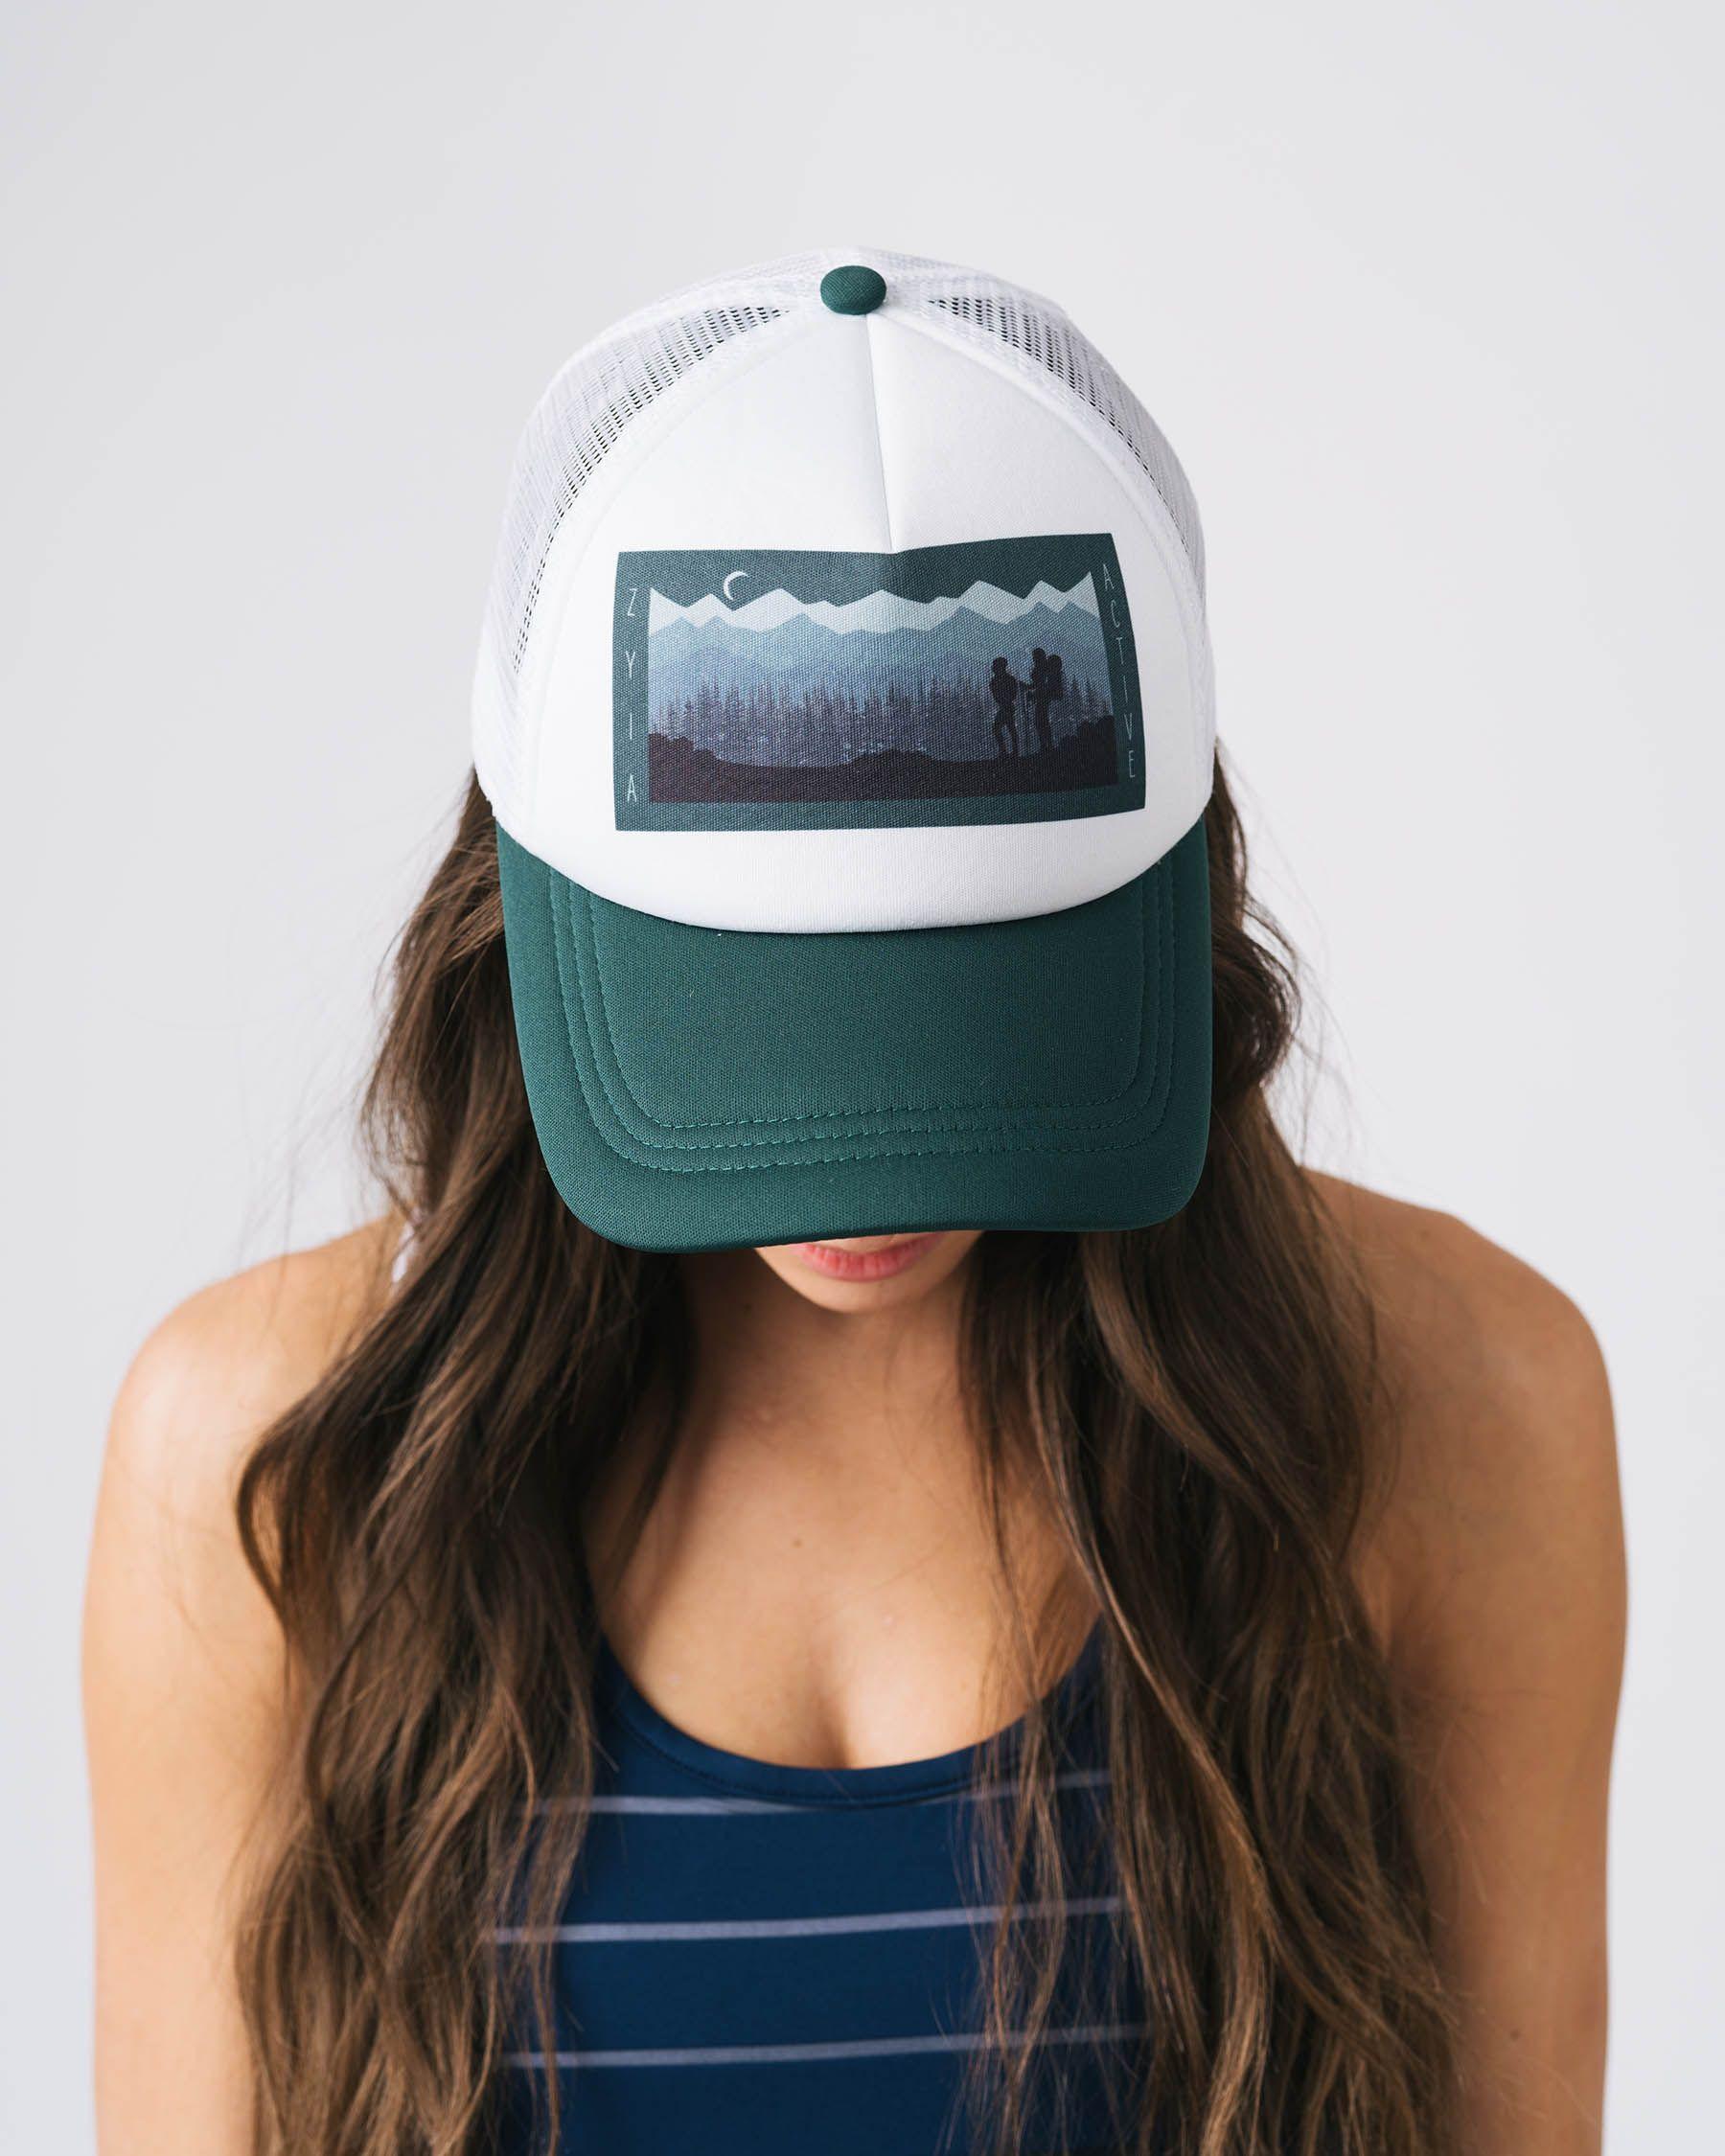 Active wear hat